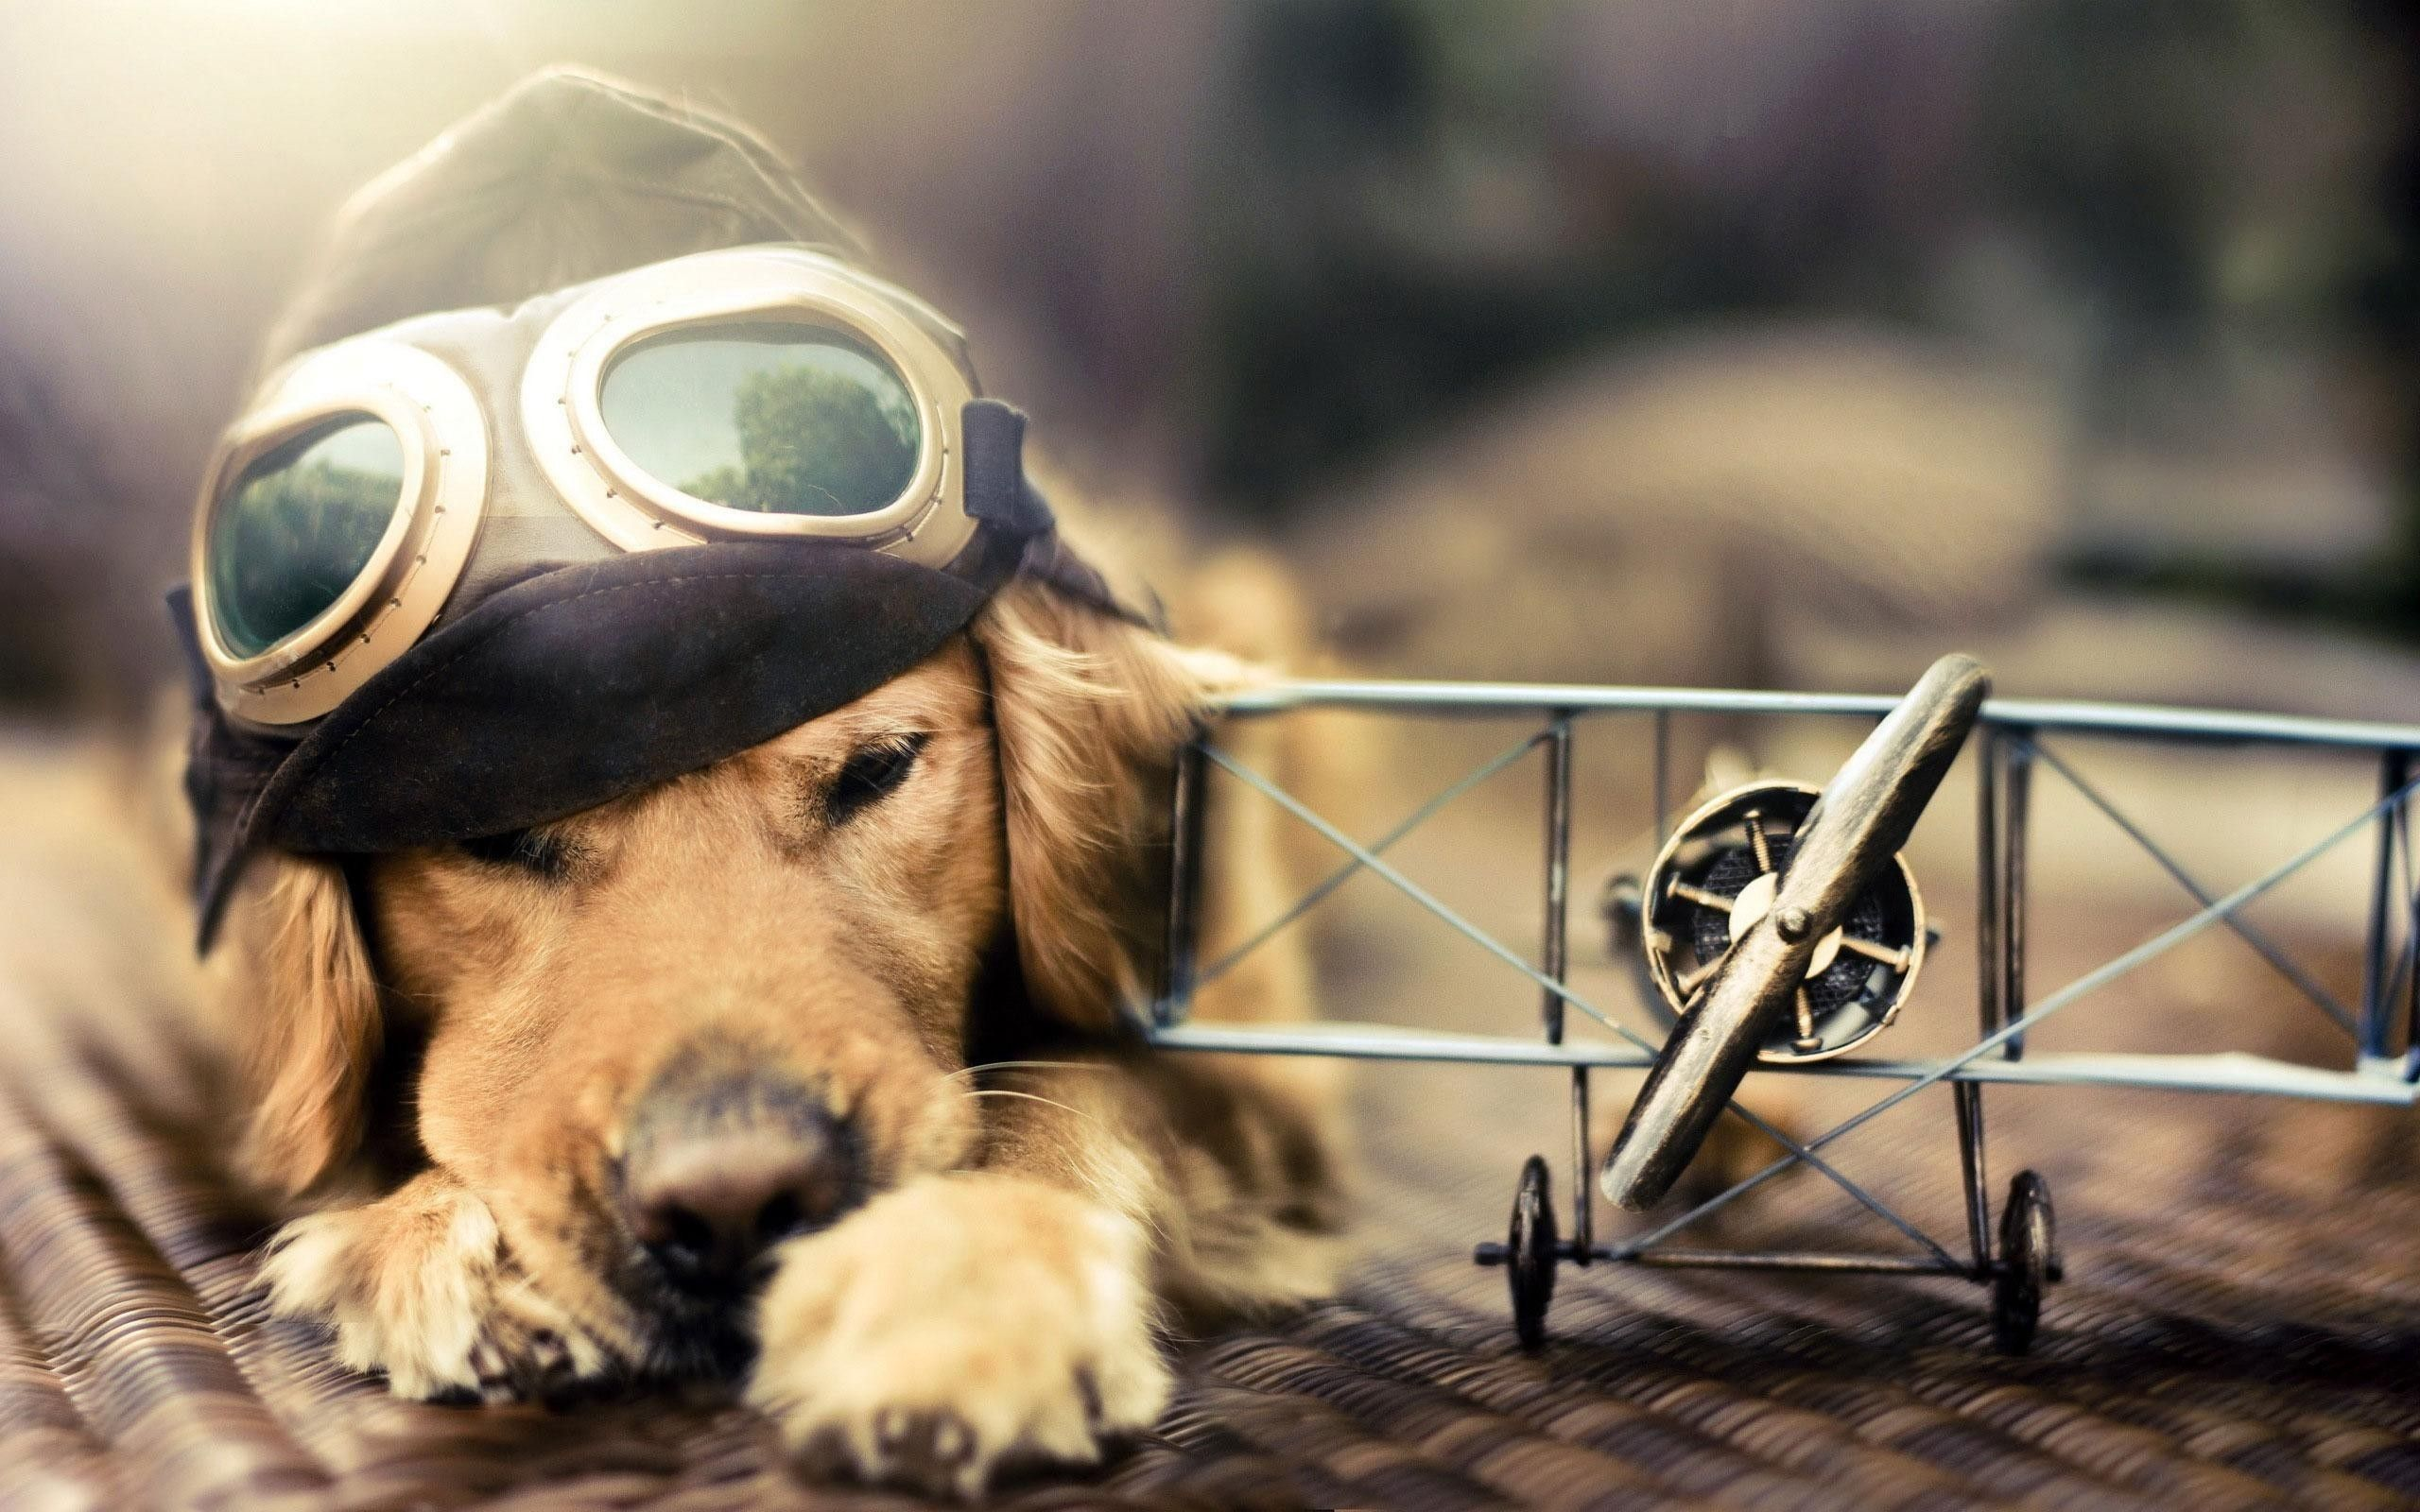 Pilot Sunlight Airplane Dog Miniatures Goggles Animals